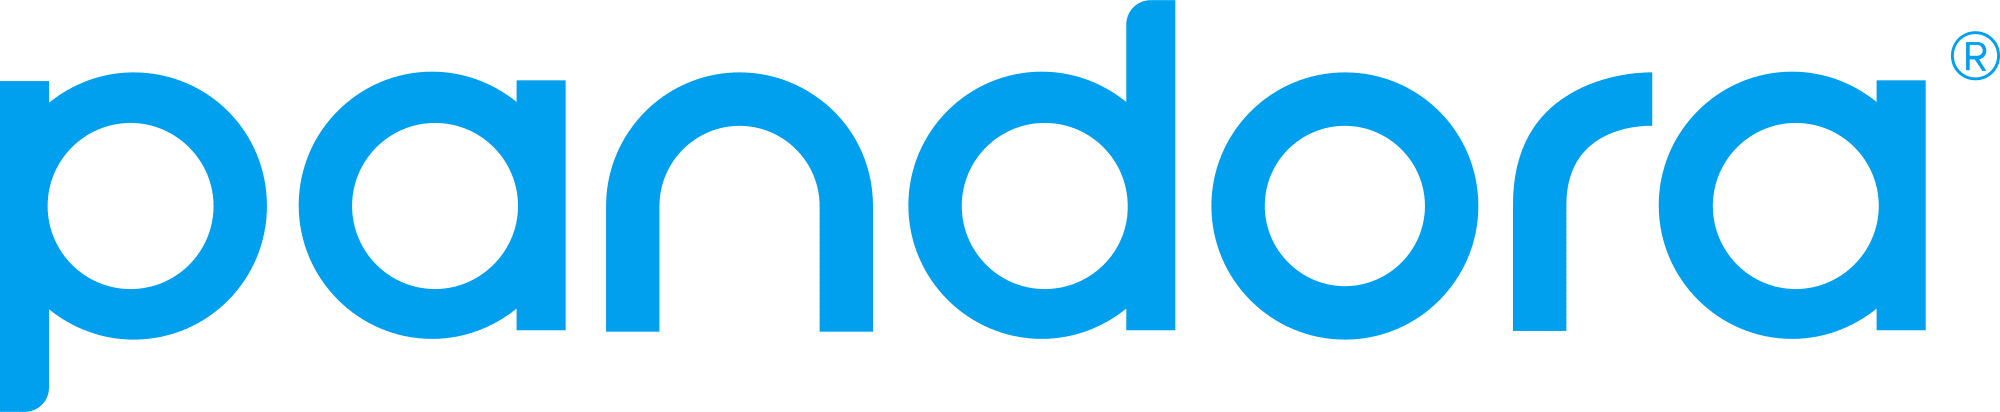 pandora-music-logo-2000x412